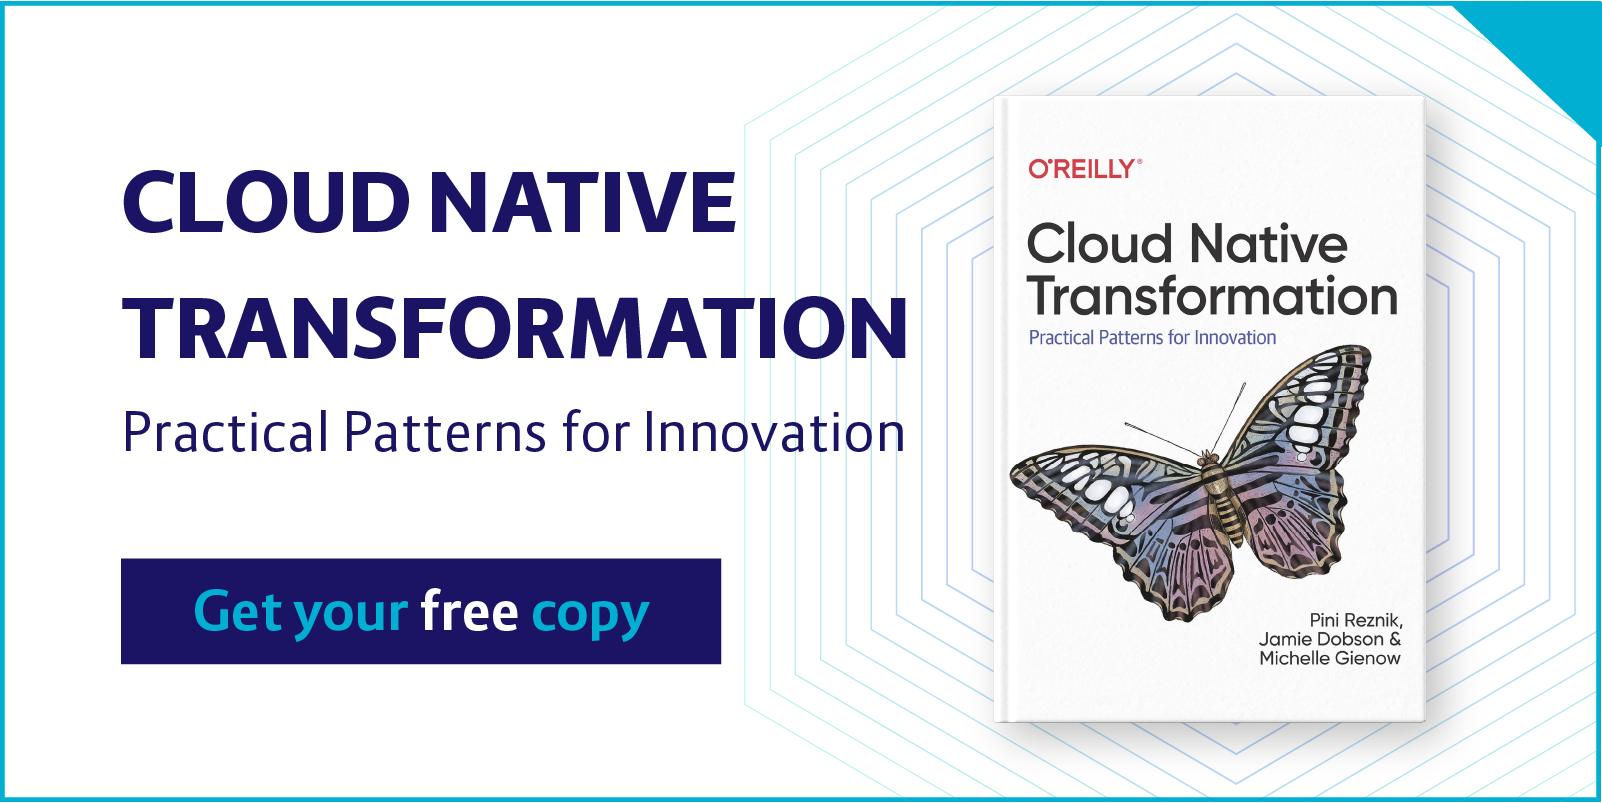 cn_transformation_webinar_pini_book copy-2